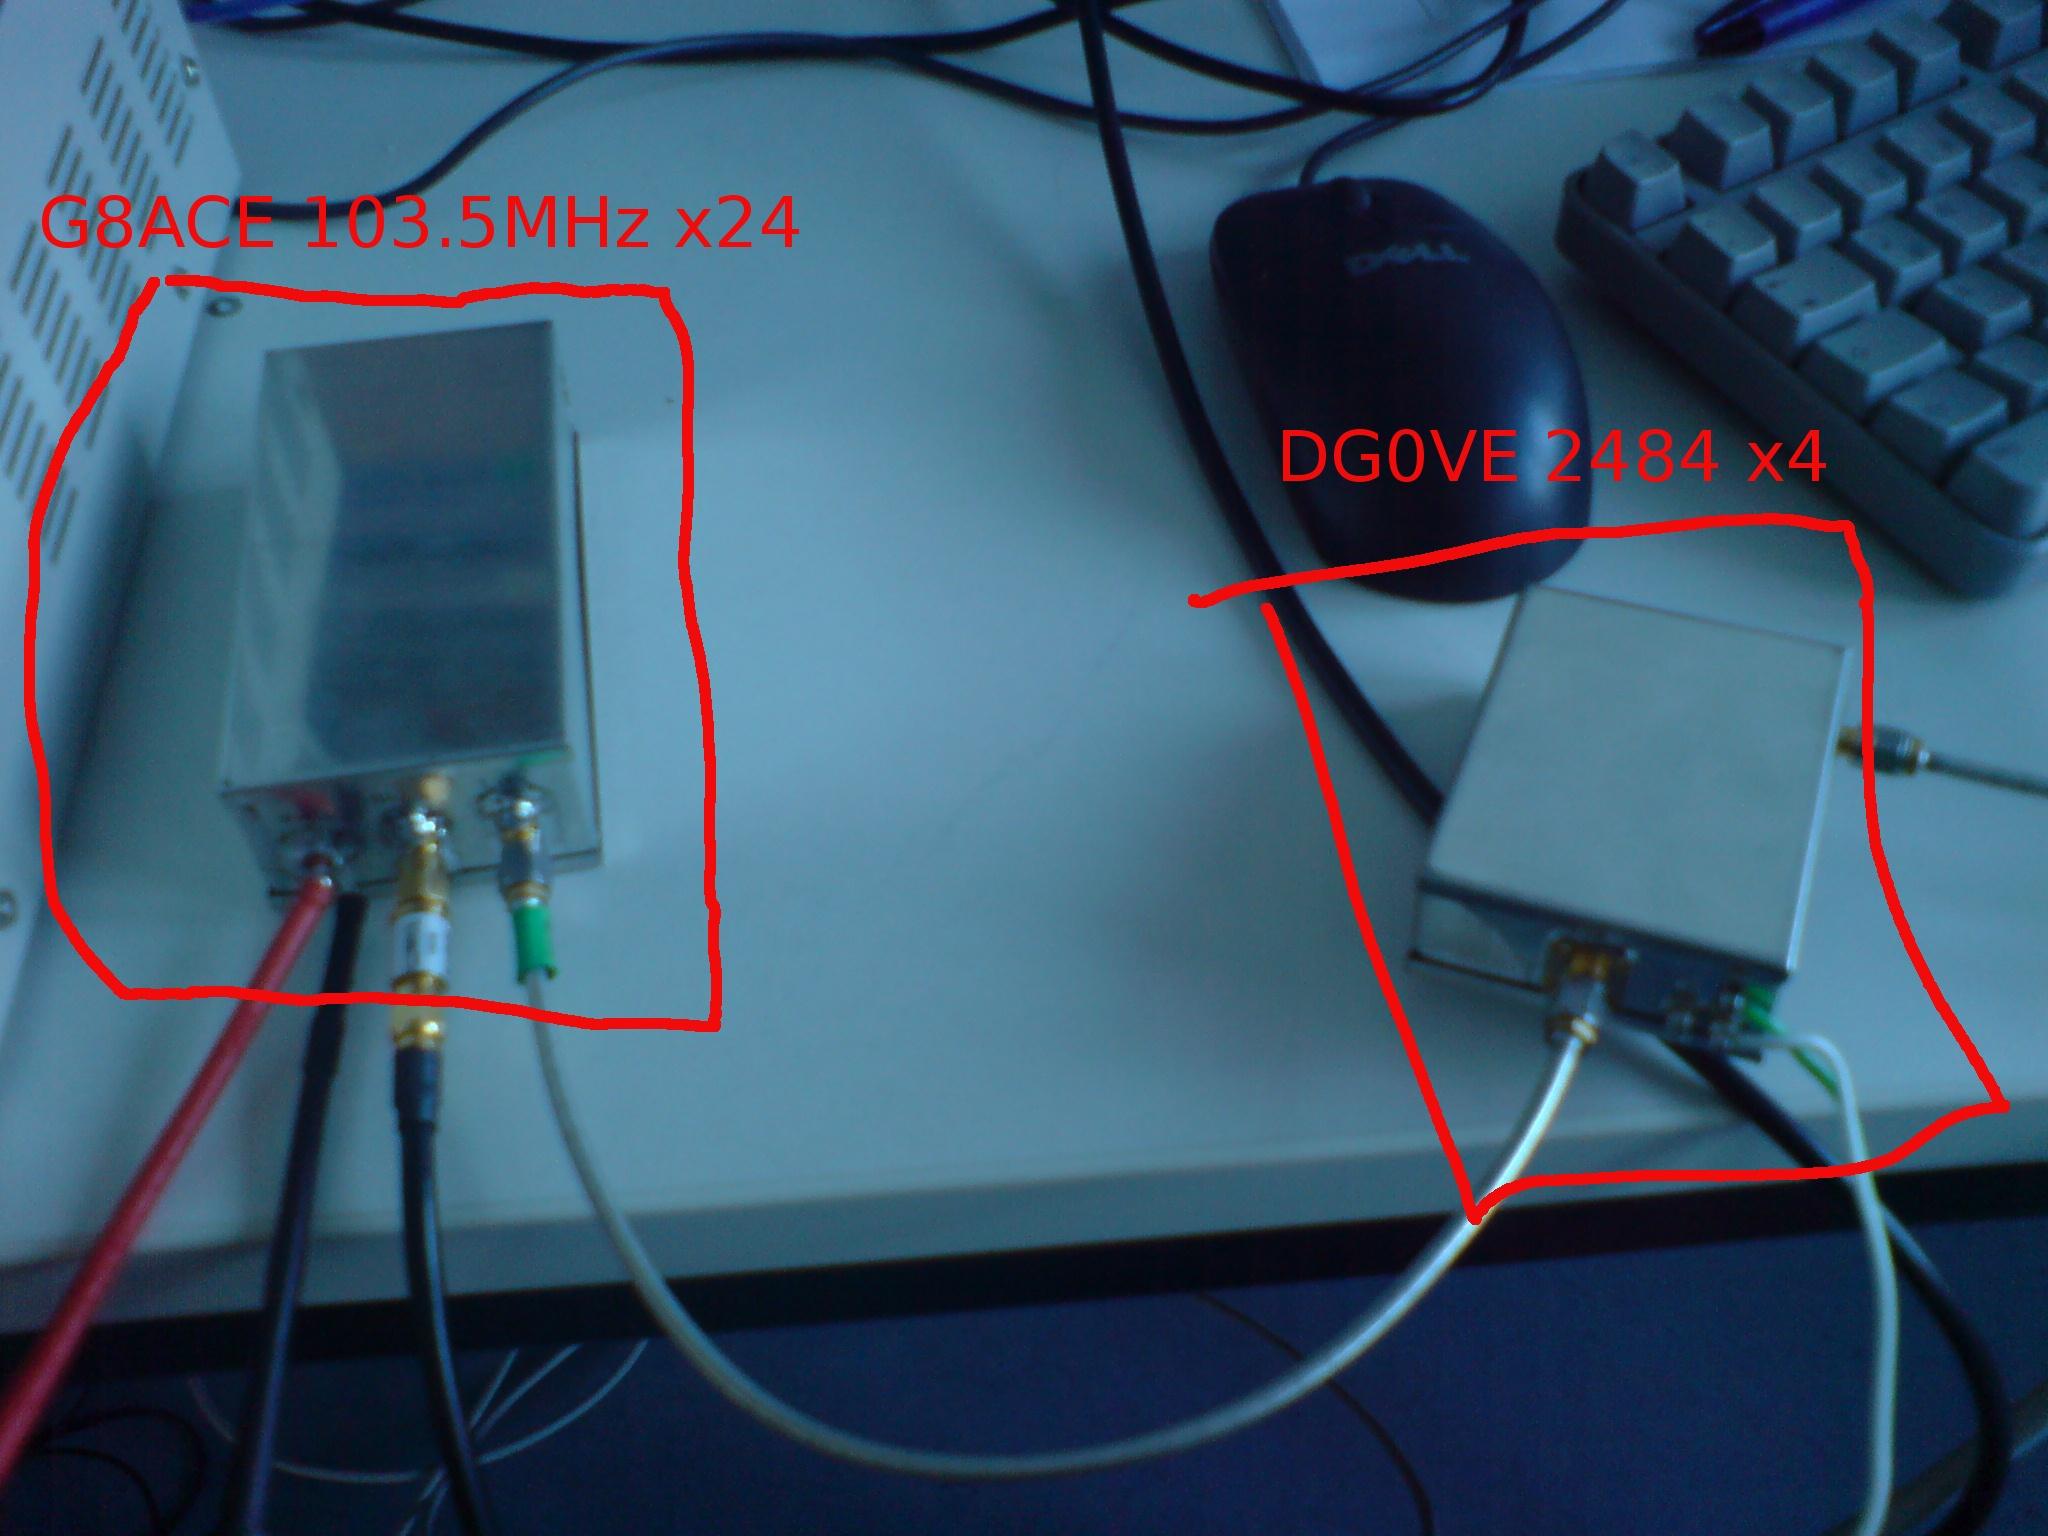 Multiplier Chain for 70cm -> 10GHz conversion | Rauschfunk